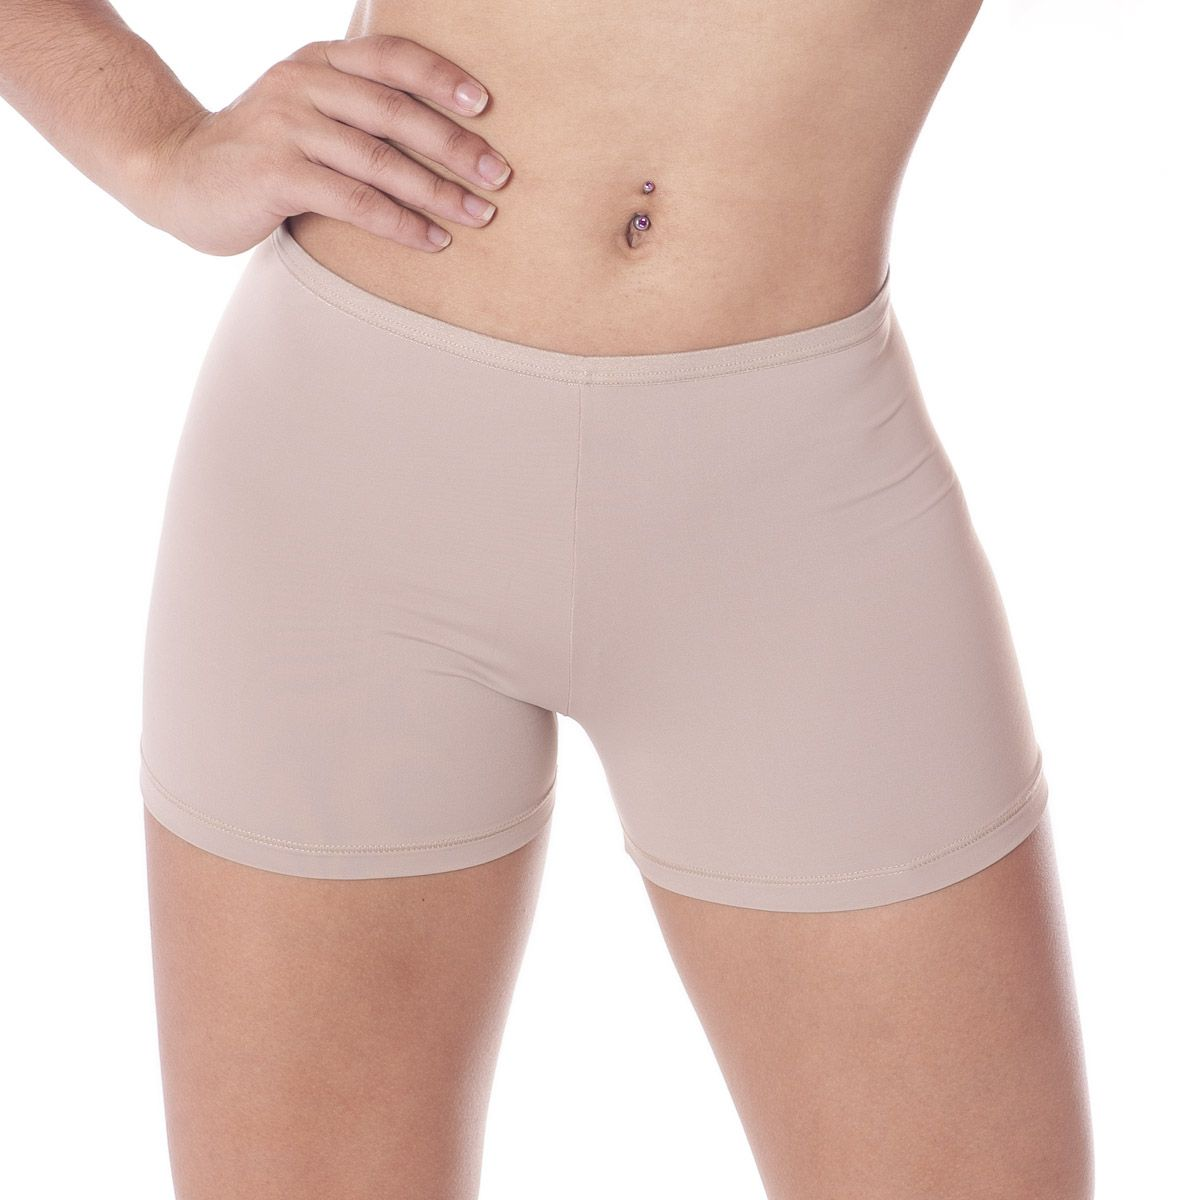 Calcinha Short Moda Intima Lingerie shortinho cueca feminina Leluc -